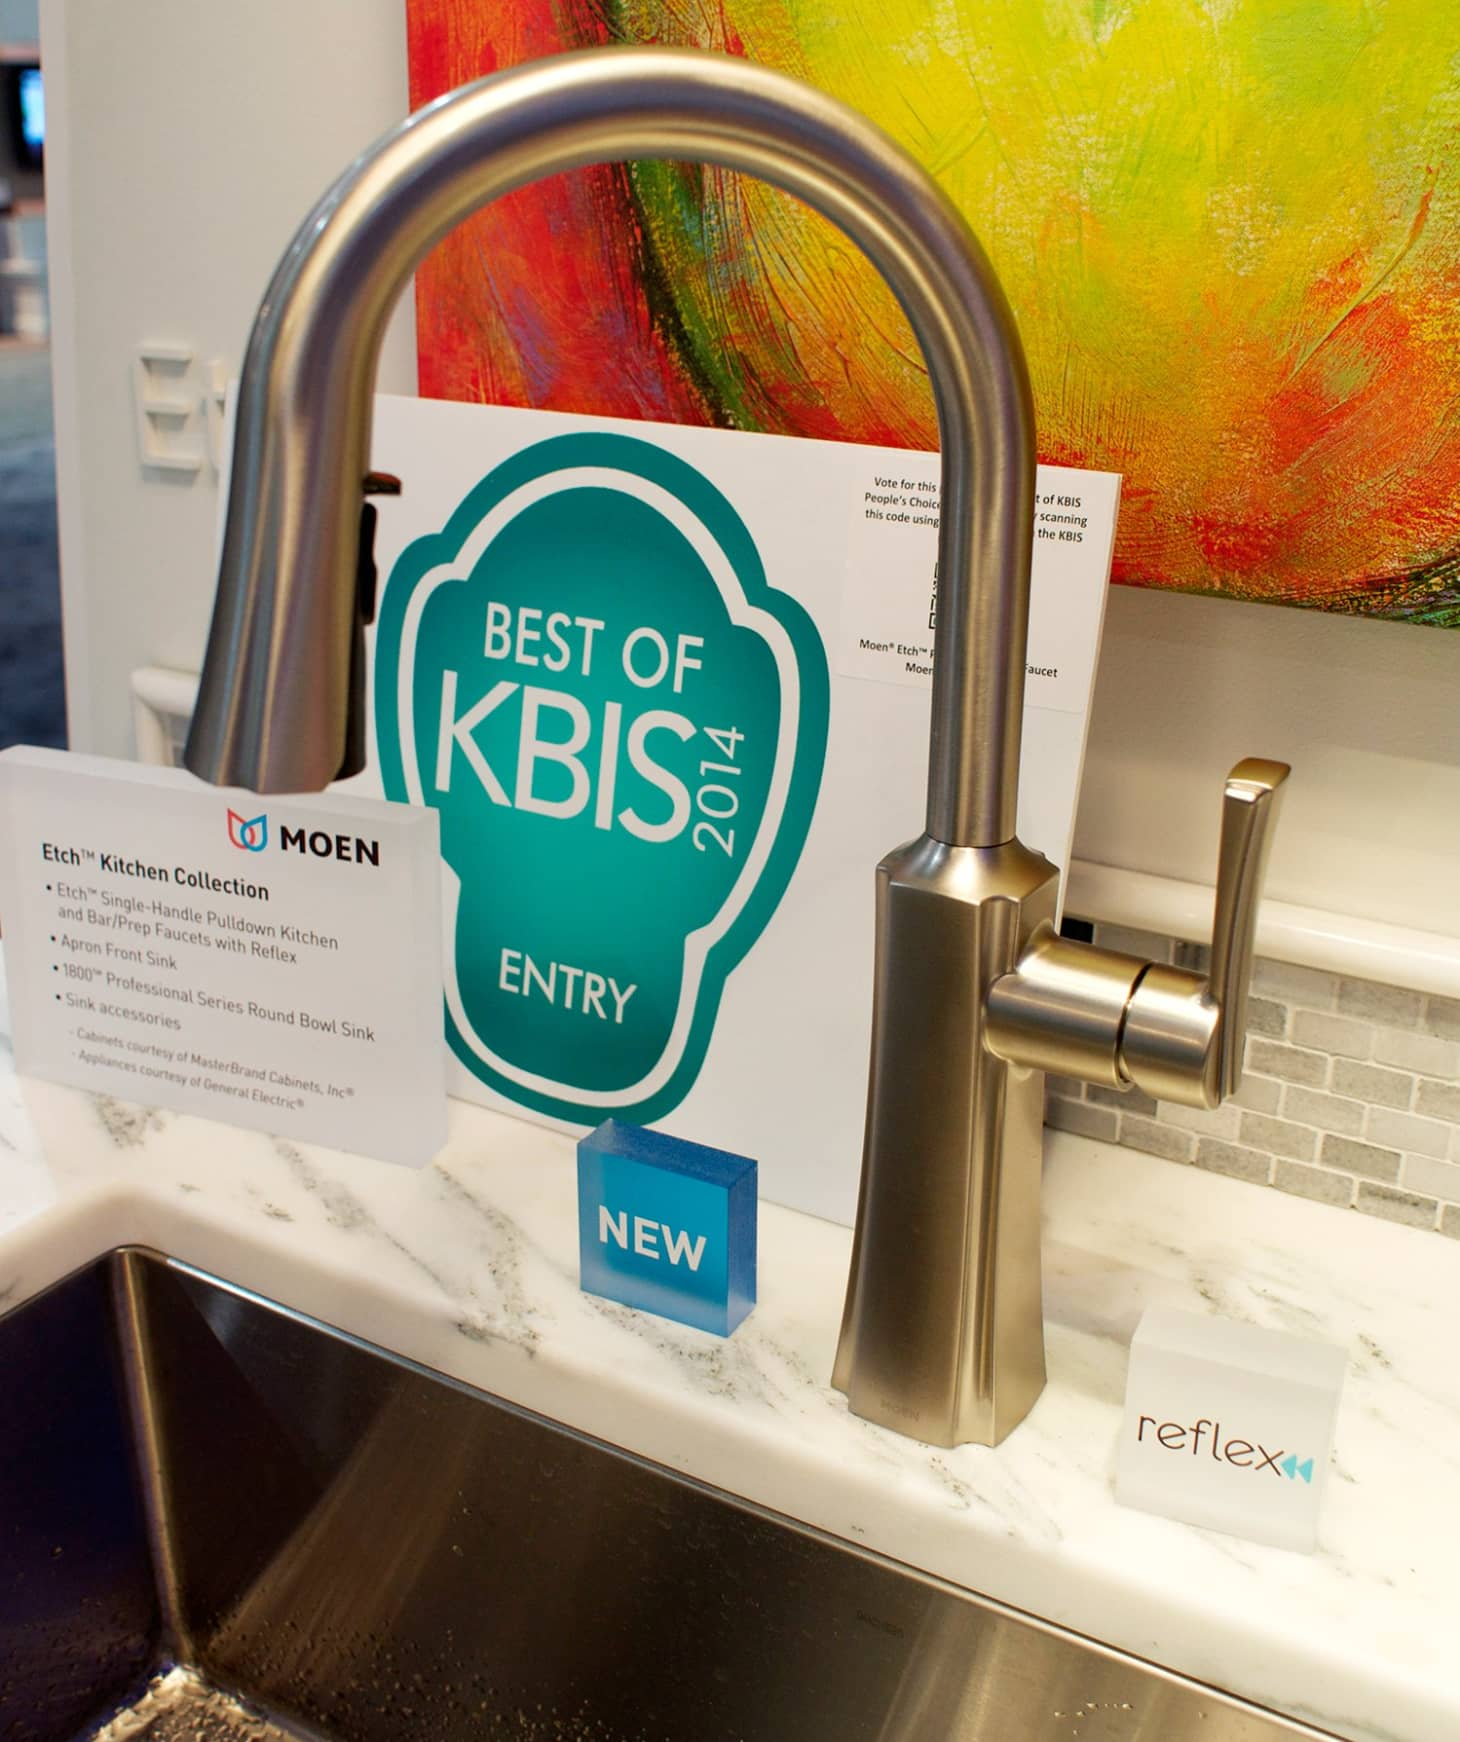 Kbis Trend Report Smart Faucets Sink Accessories From Moen